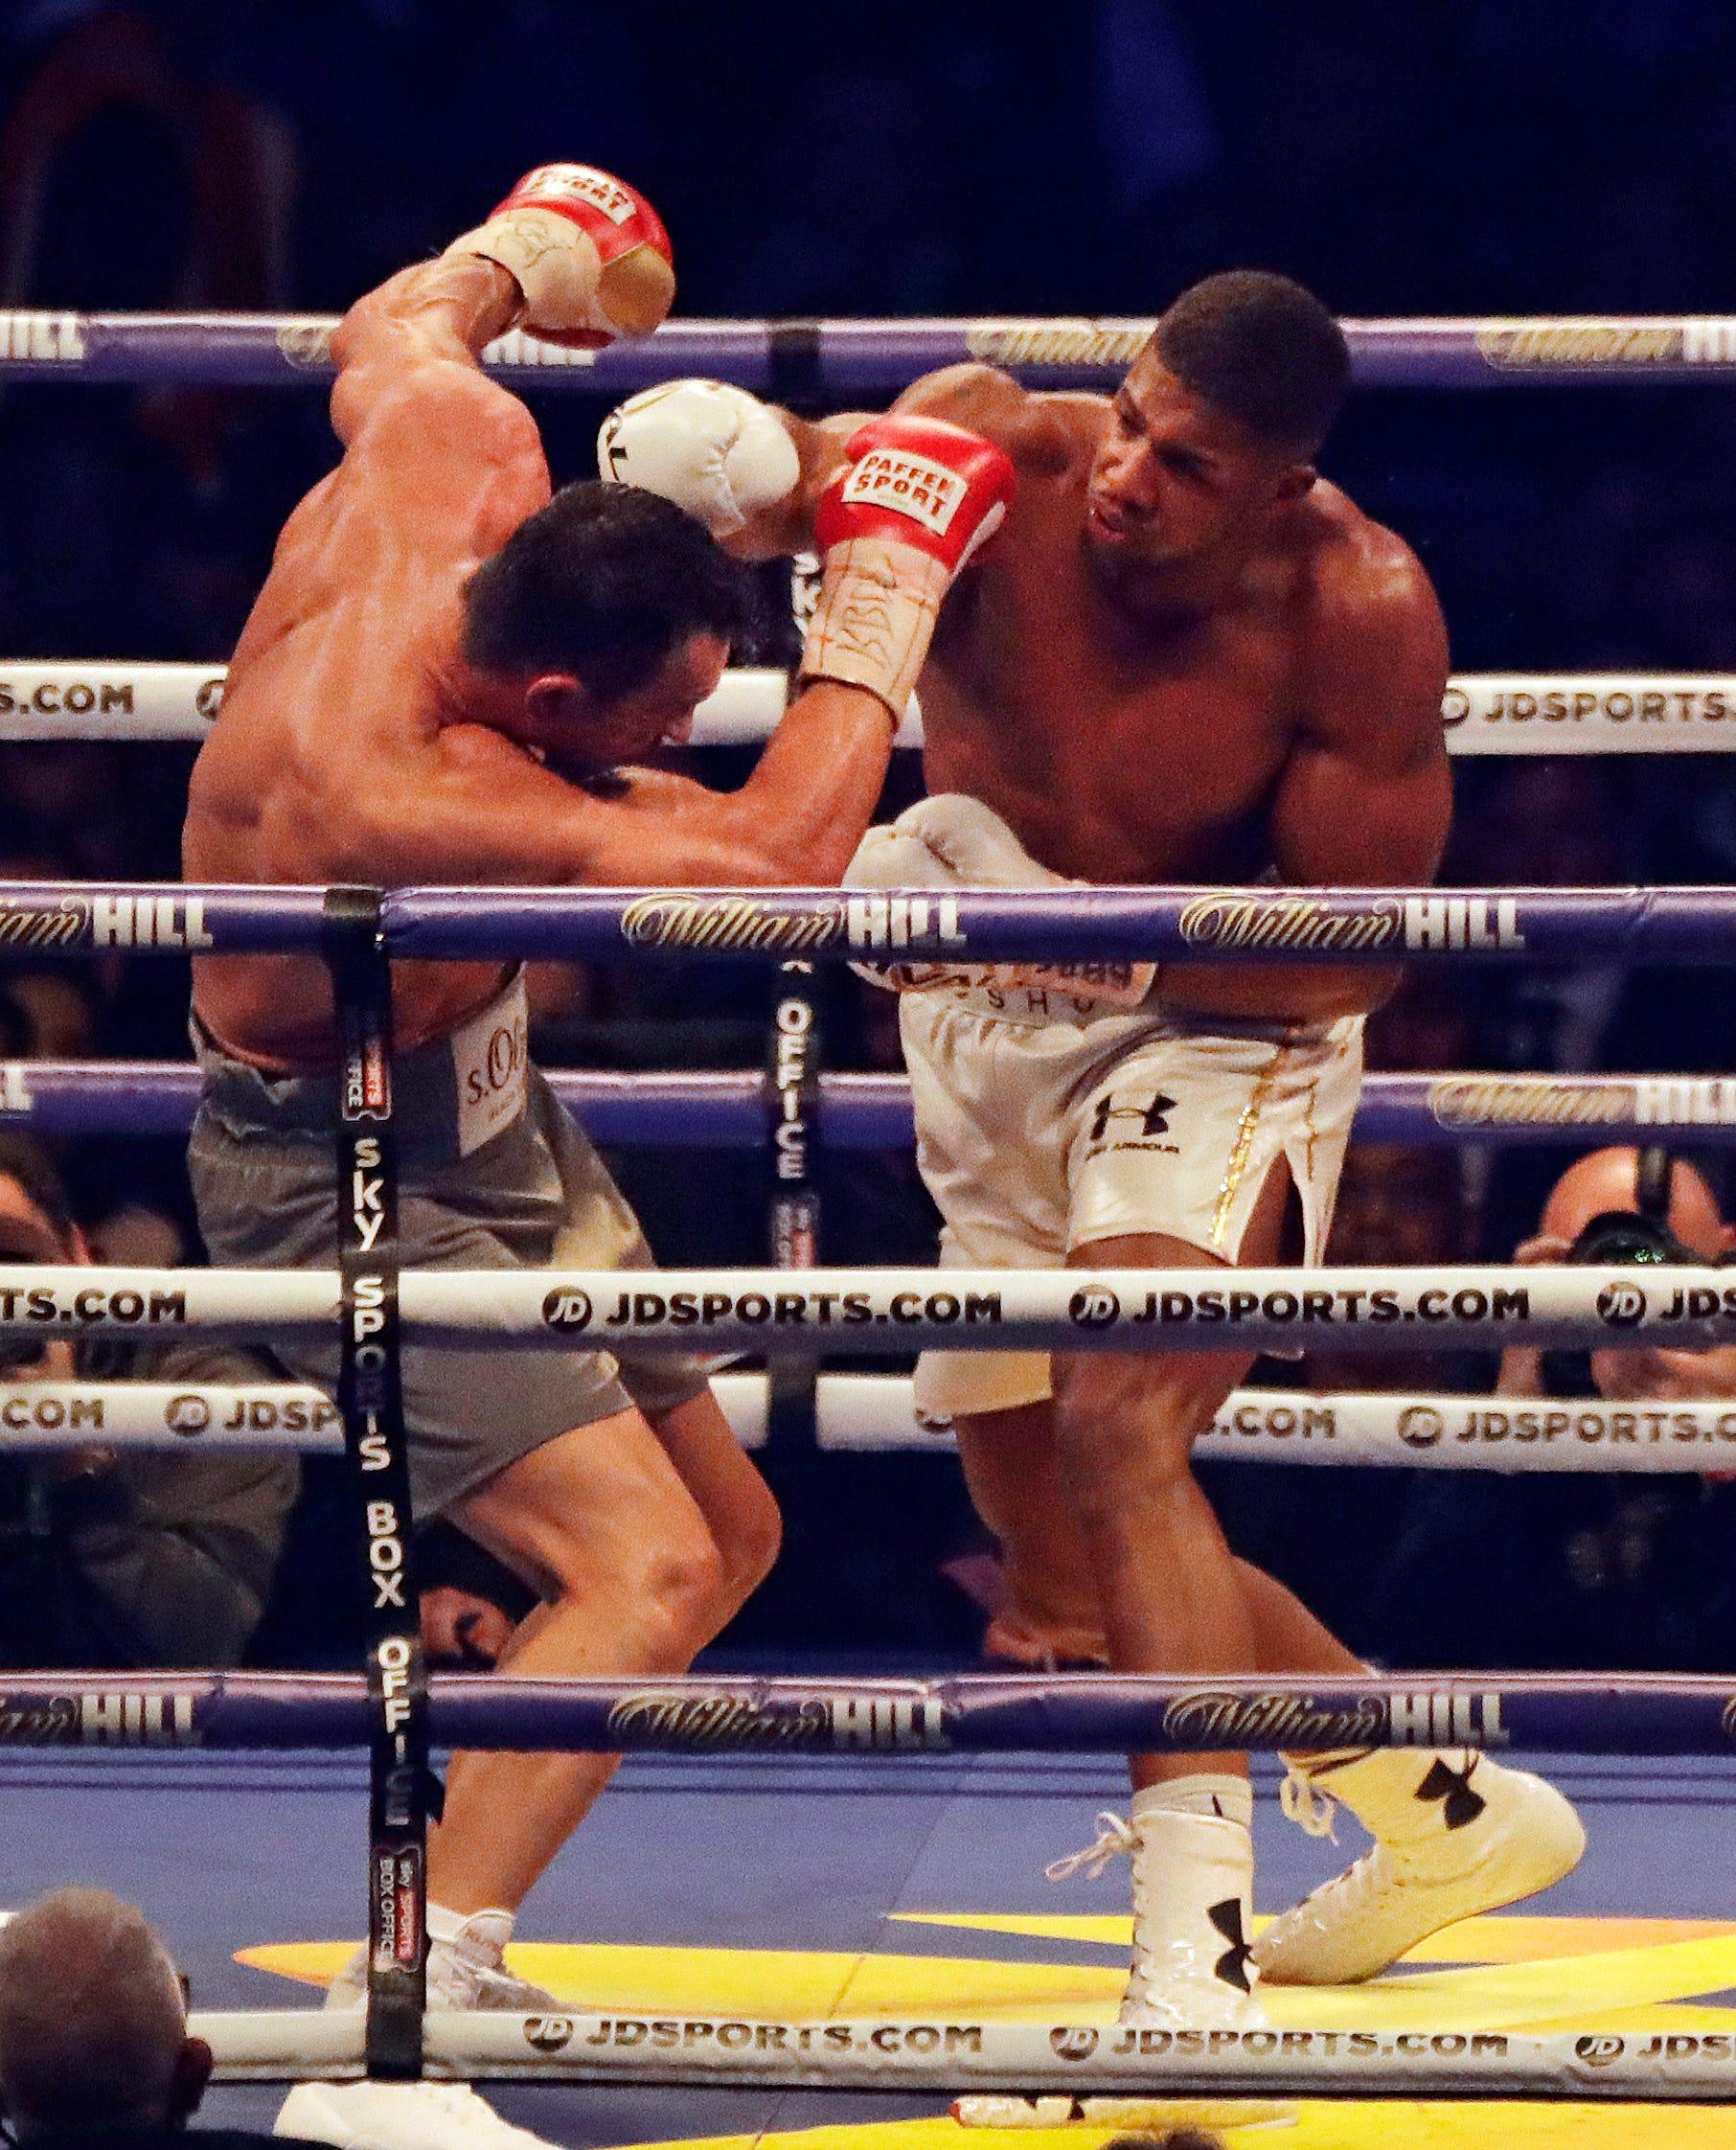 Anthony Joshua Beats Wladimir Klitschko In Epic